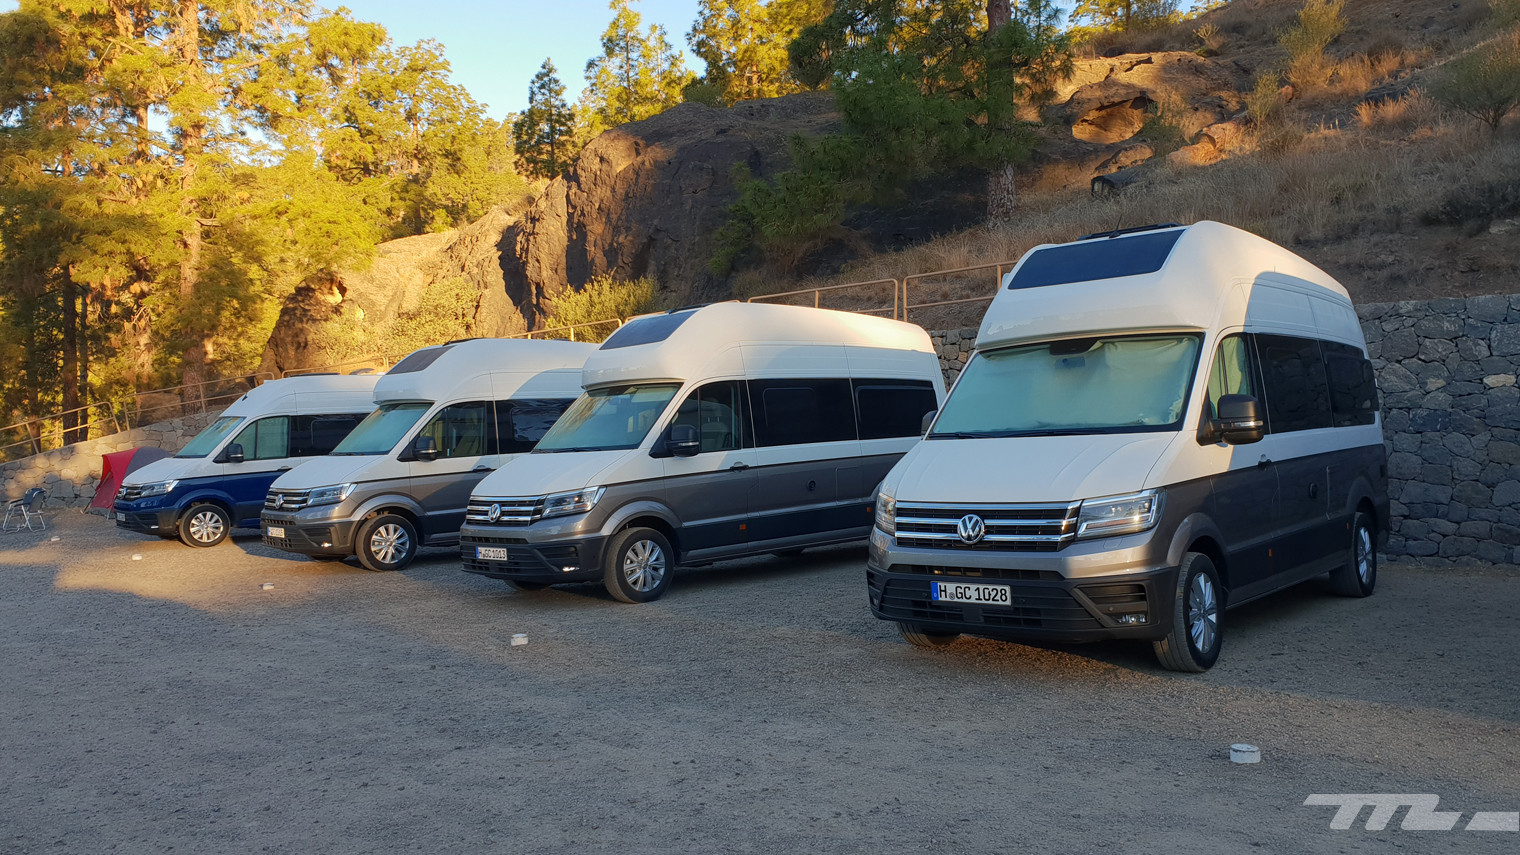 Foto de Volkswagen Grand California 2019, toma de contacto (10/118)